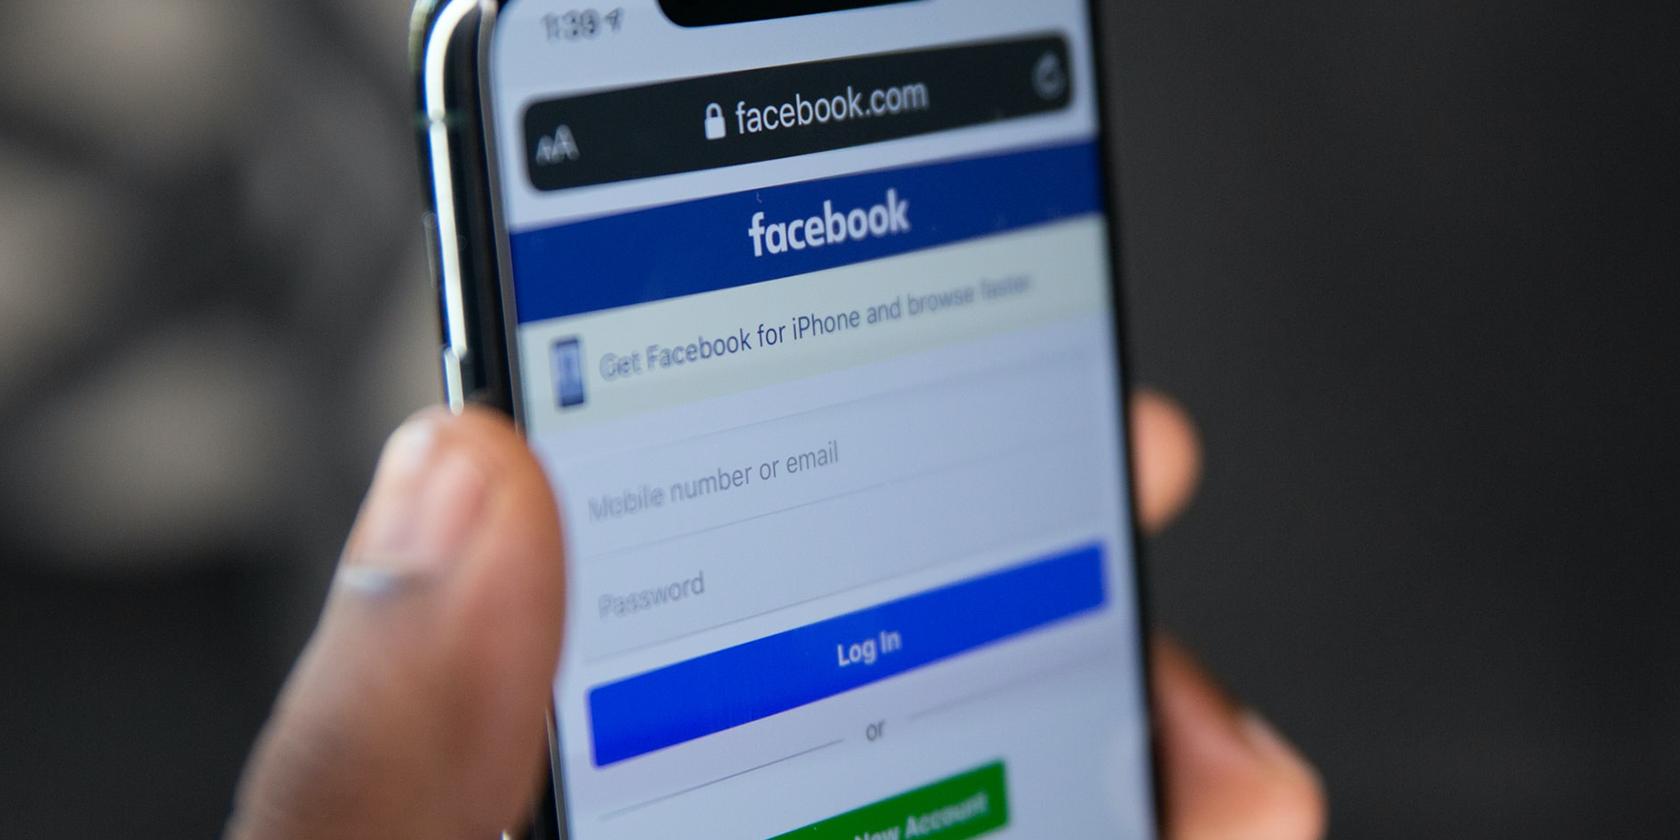 Facebook Continues to Host Anti-Vax Theme Profile Borders Despite Ban